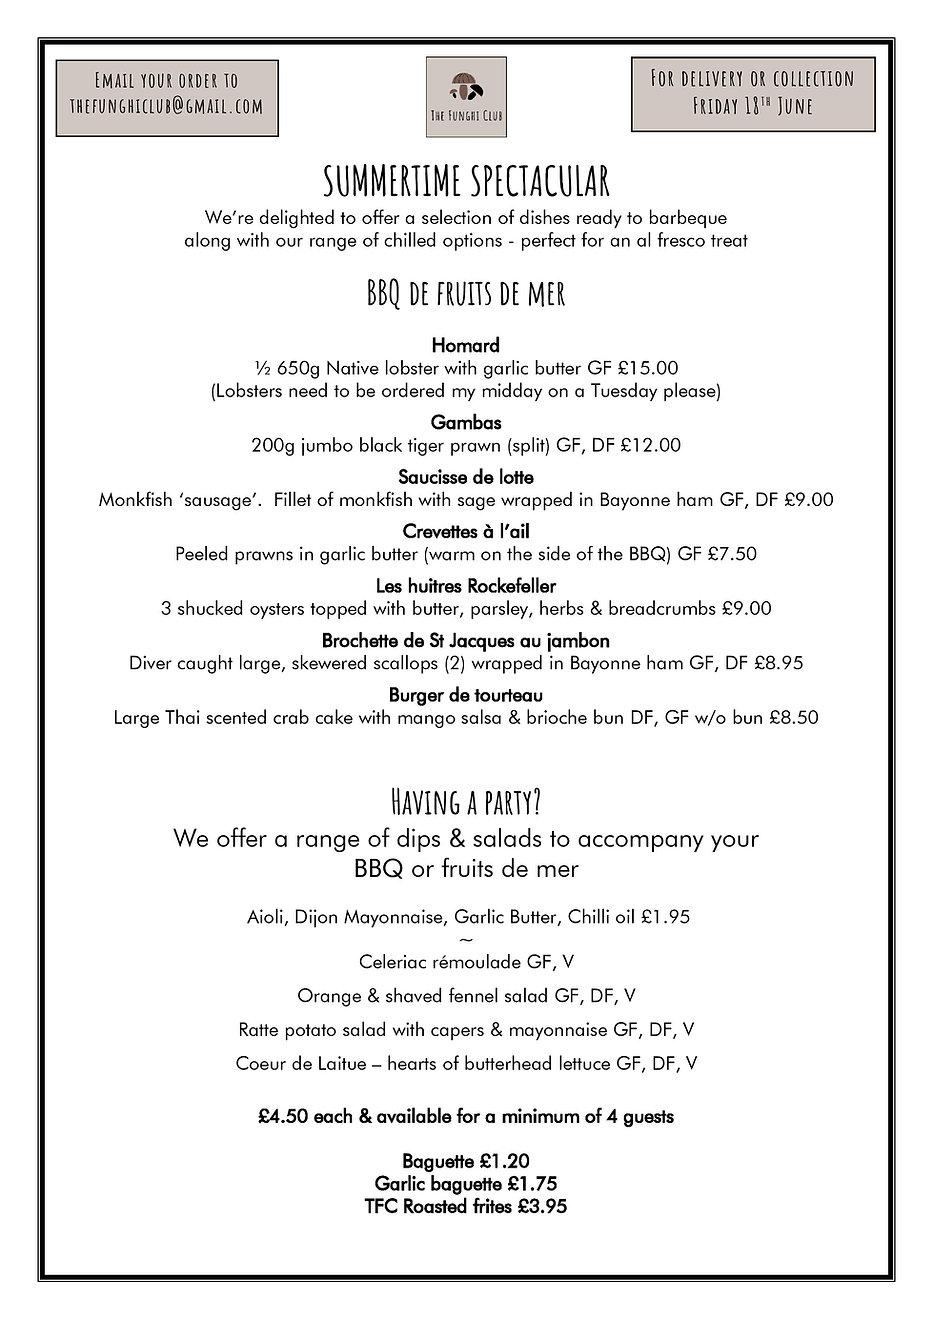 Heat & Eat Menu WC 14.6.21-page-003 (1).